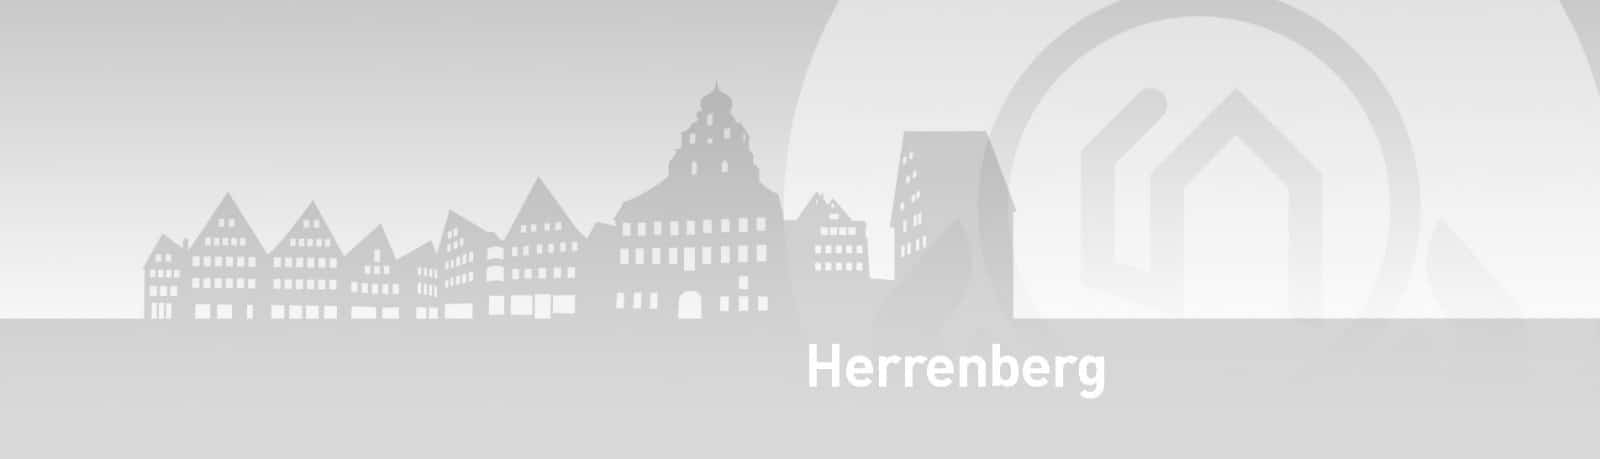 Herrenberg SENCURINA 1904x546 - Kalender Herrenberg